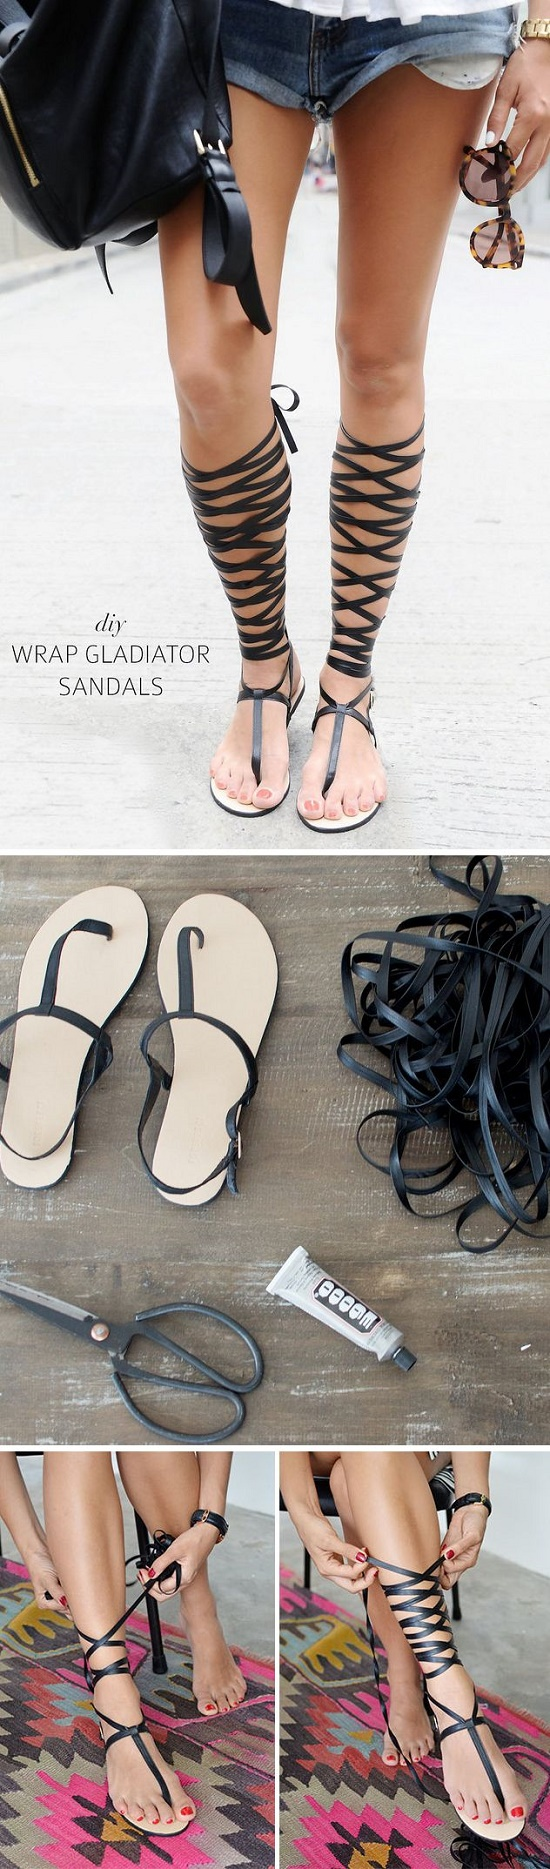 sandals DIY10